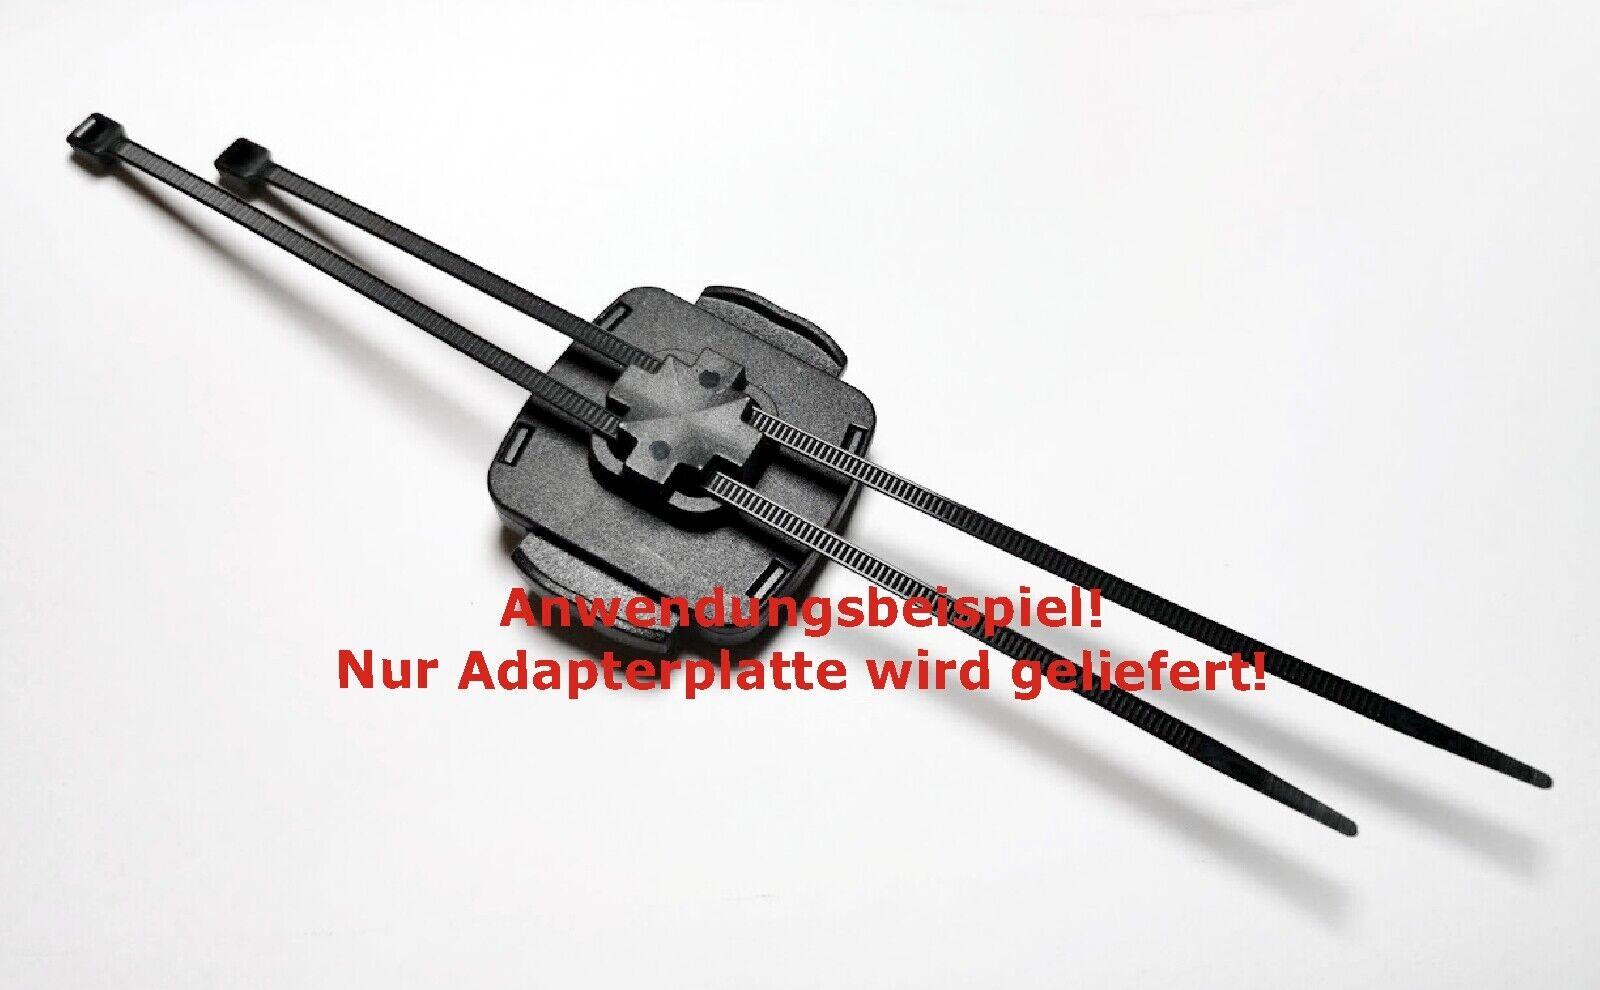 4 QuickFix placa adaptador adaptadores Quick Fix para jueces//hr soportes soporte